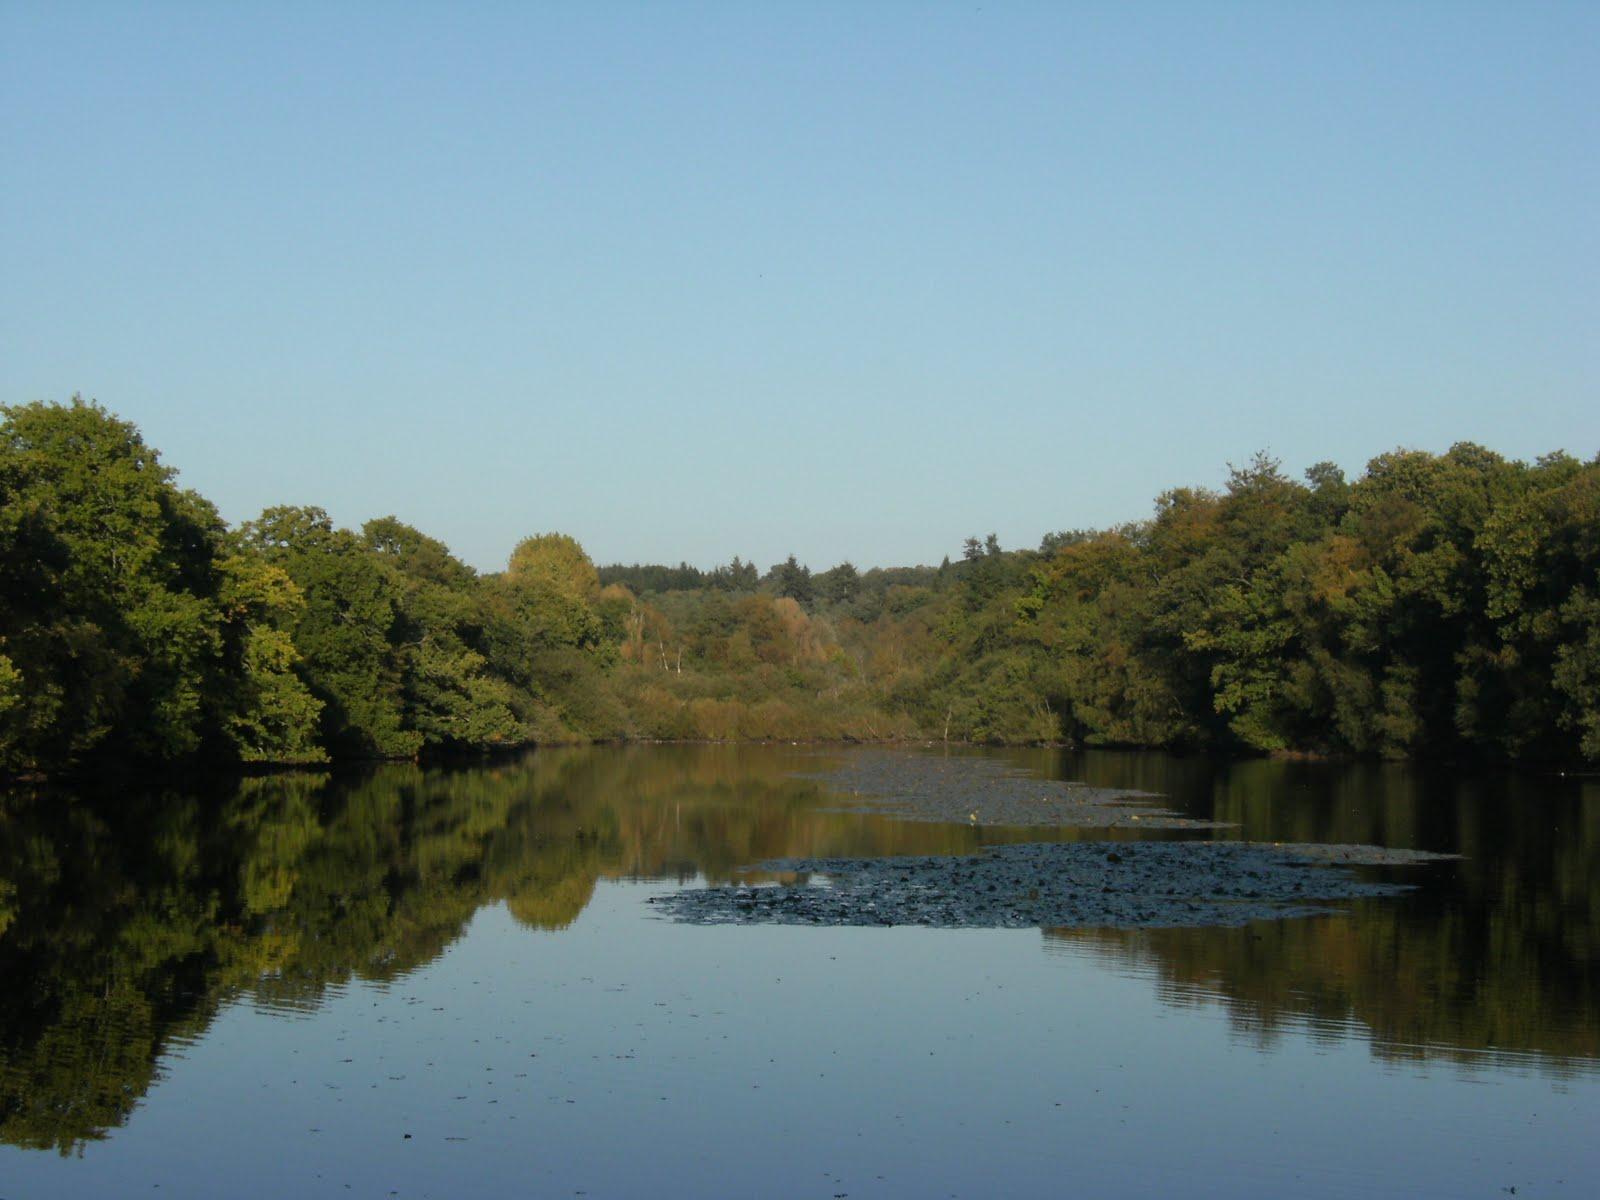 DSCF0028 Broadhurst Lake